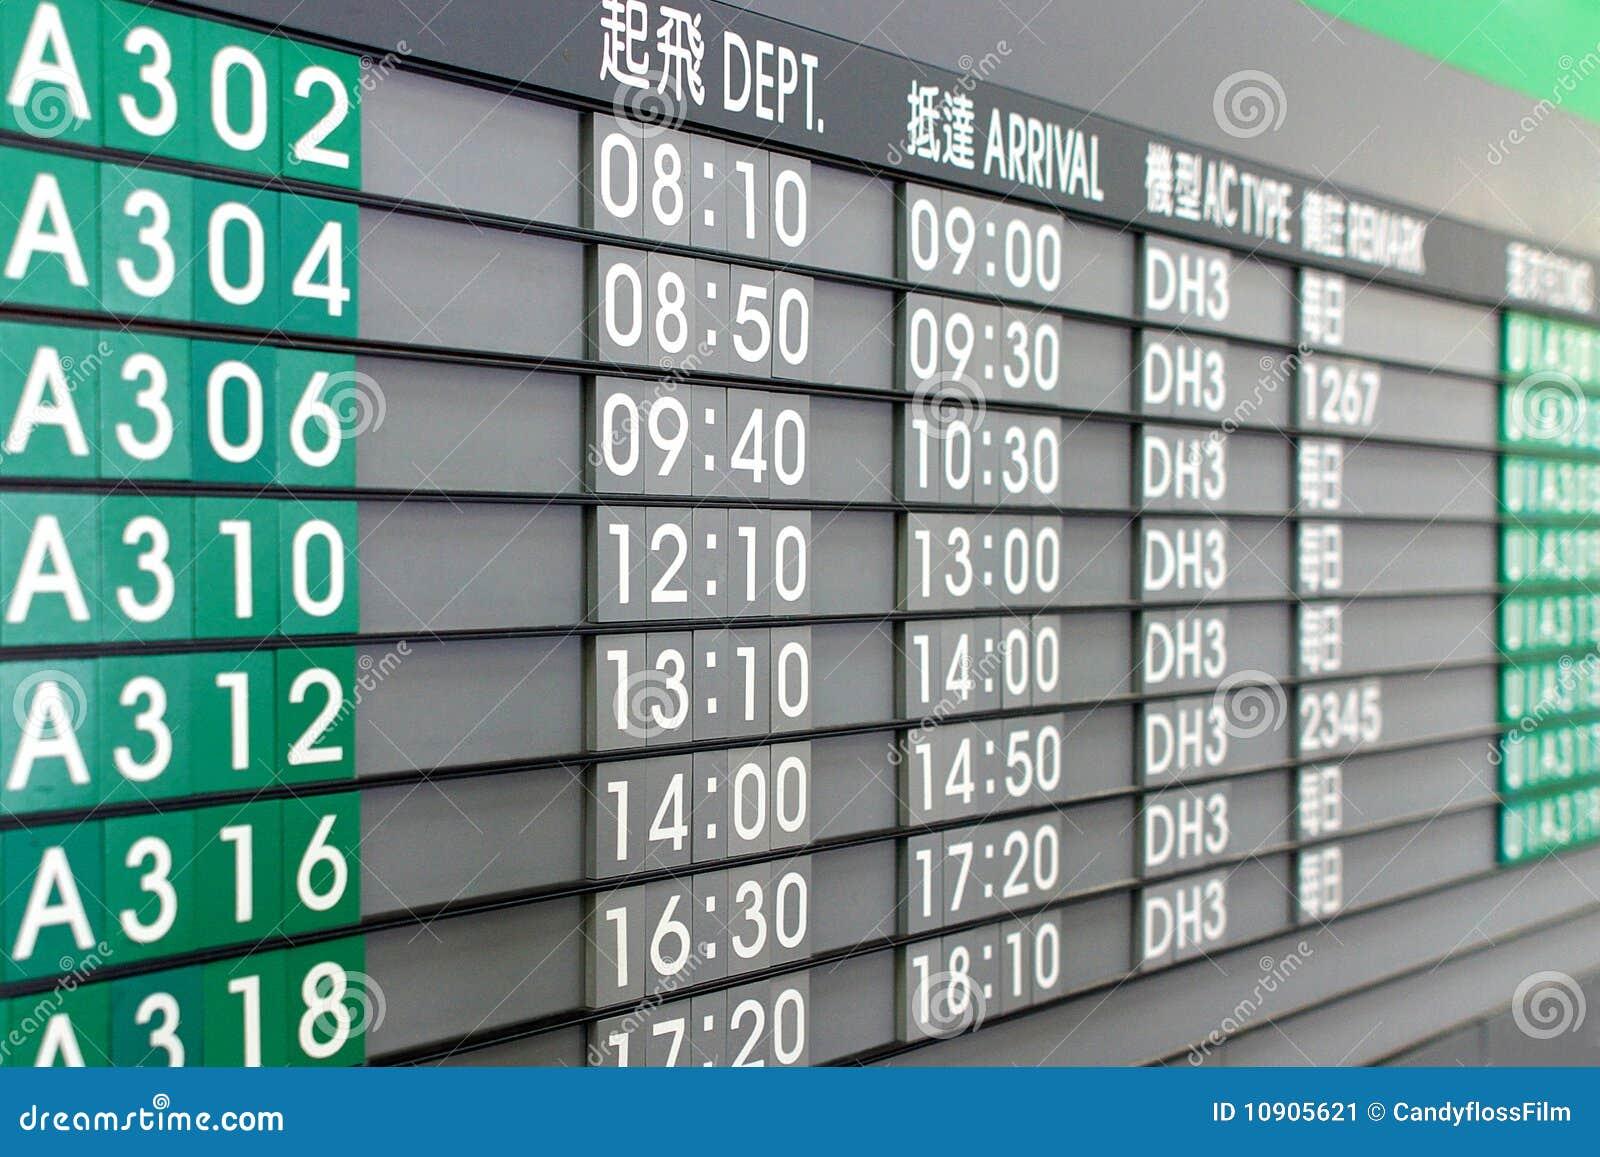 asian airways timetable